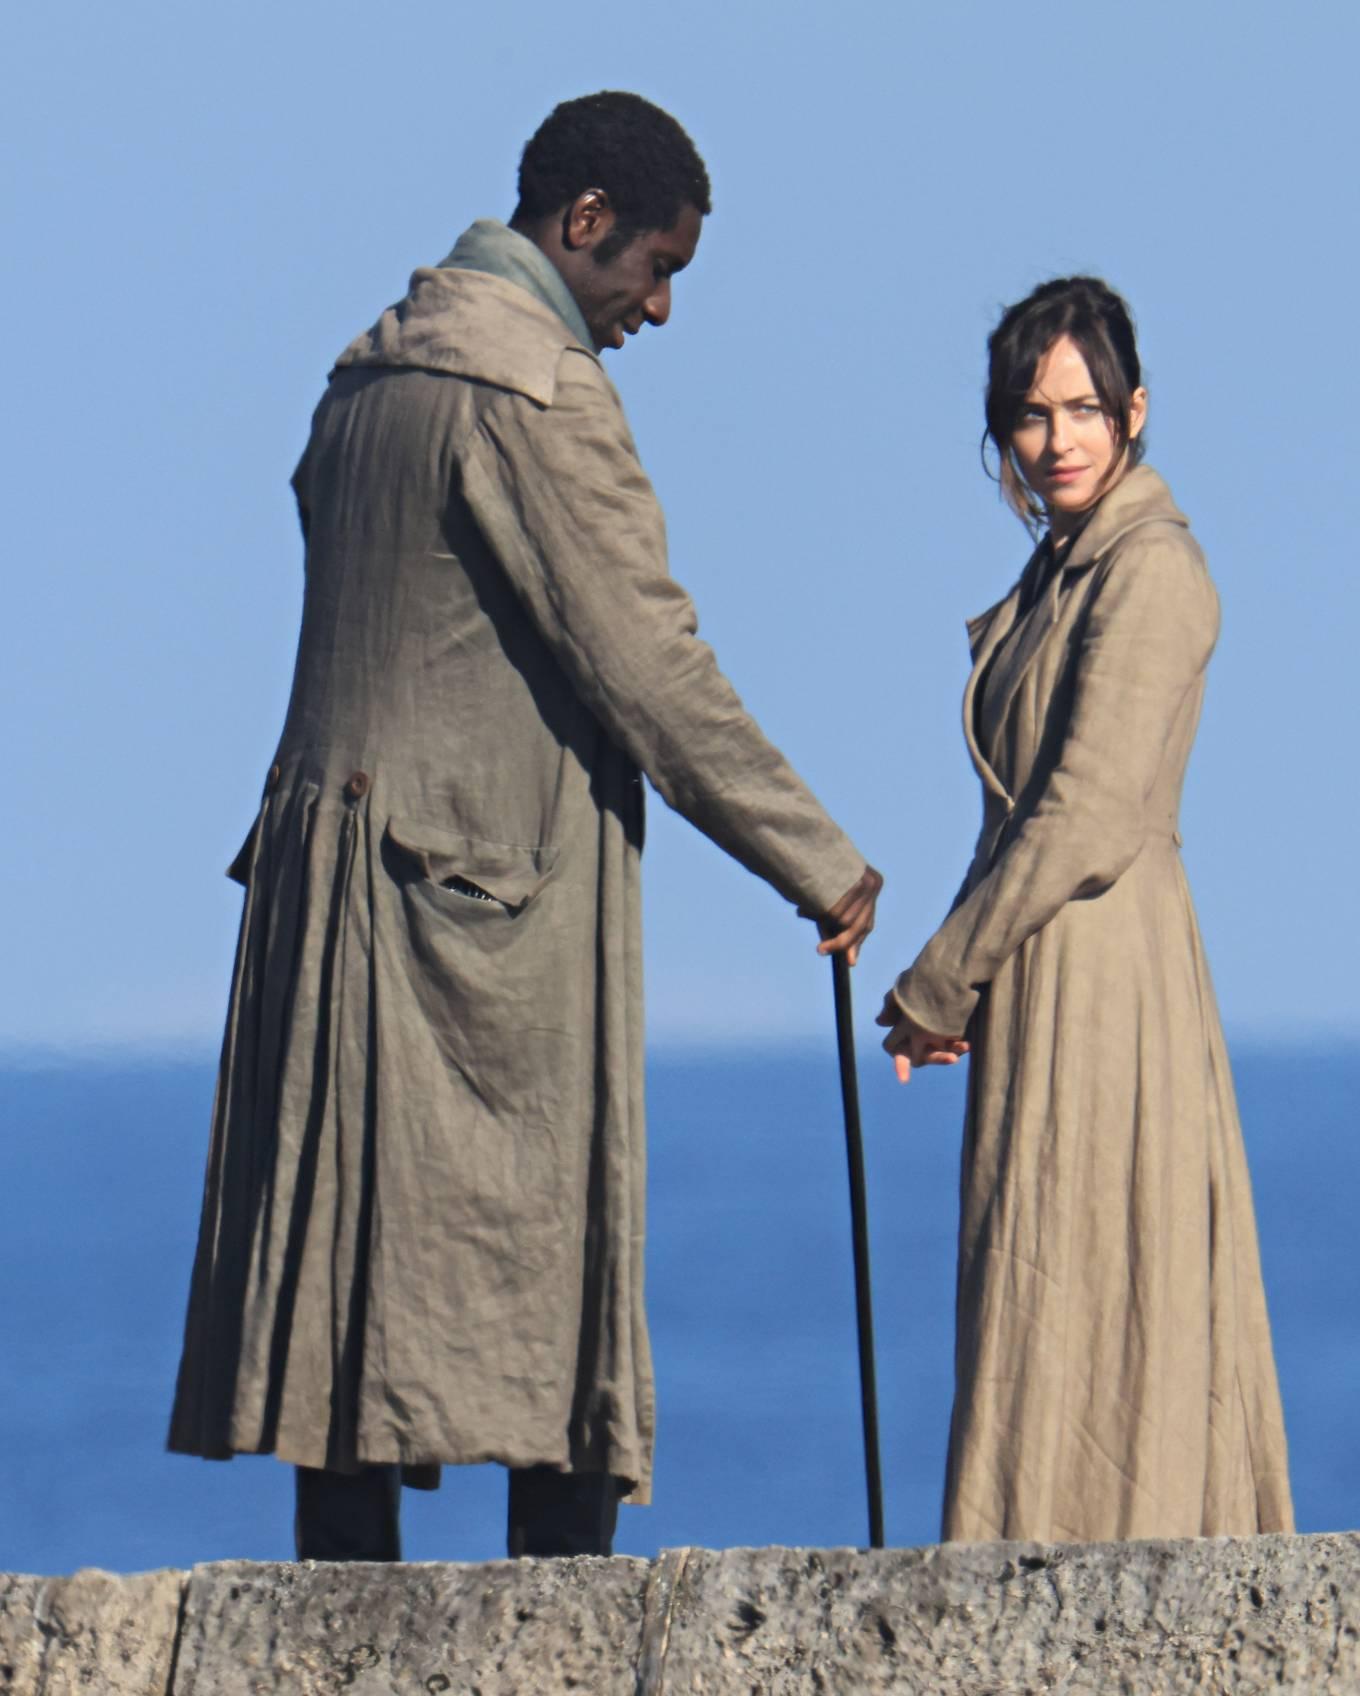 Dakota Johnson - 'Persuasion' set on The Cobb at Lyme Regis